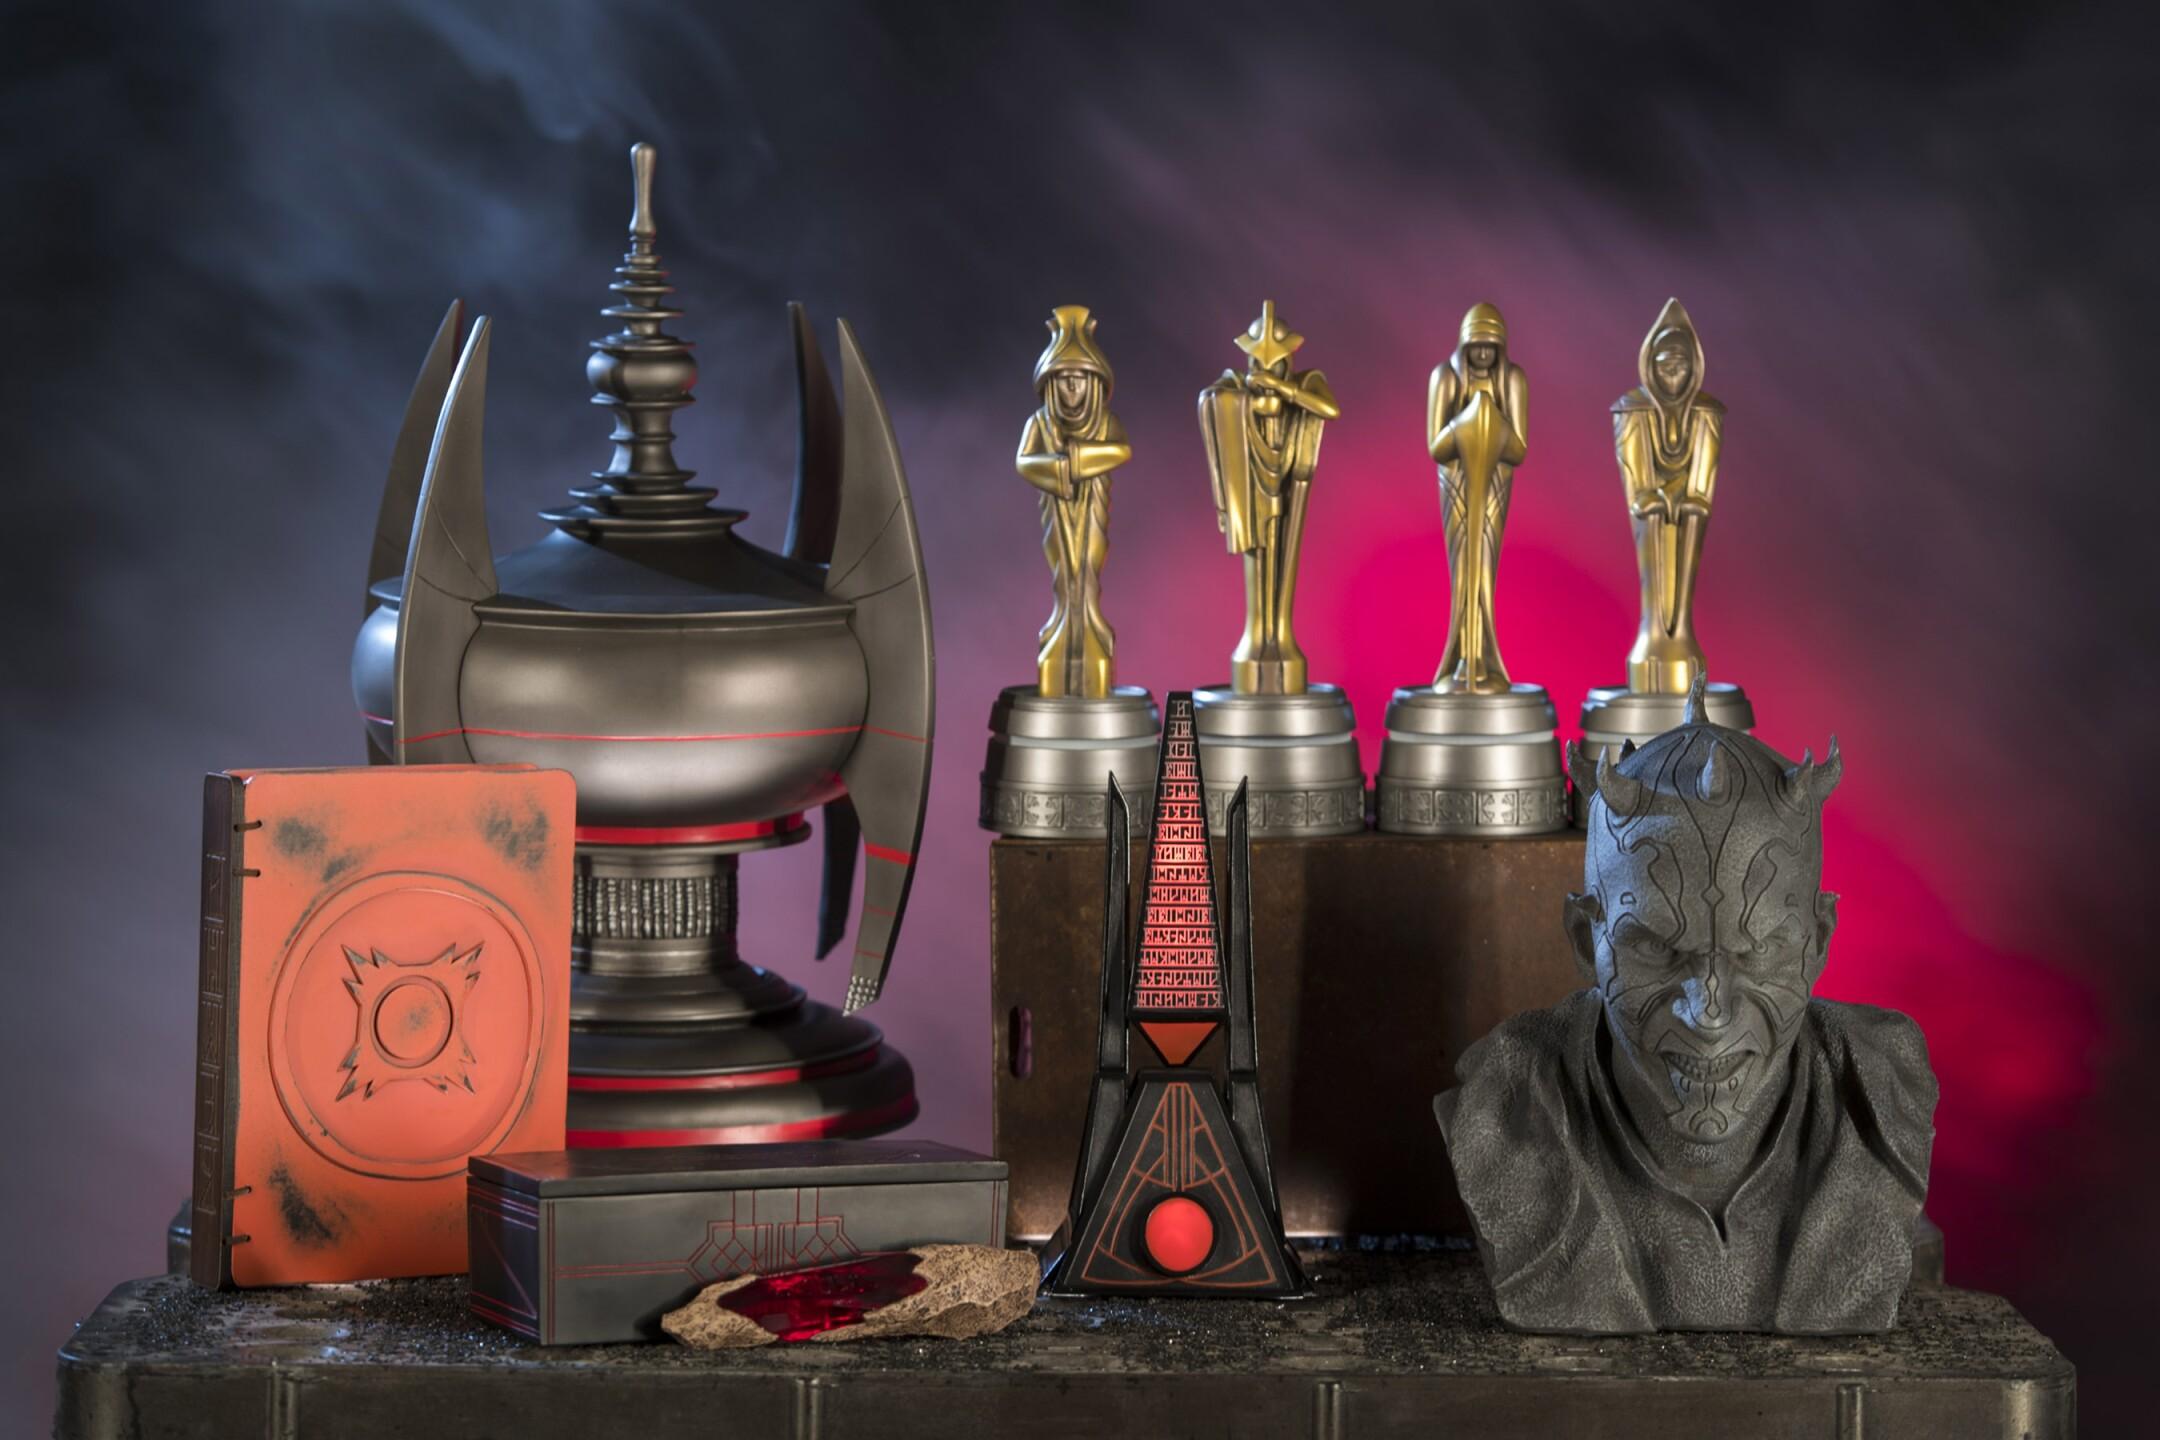 Star Wars: Galaxy's Edge Merchandise - Relics